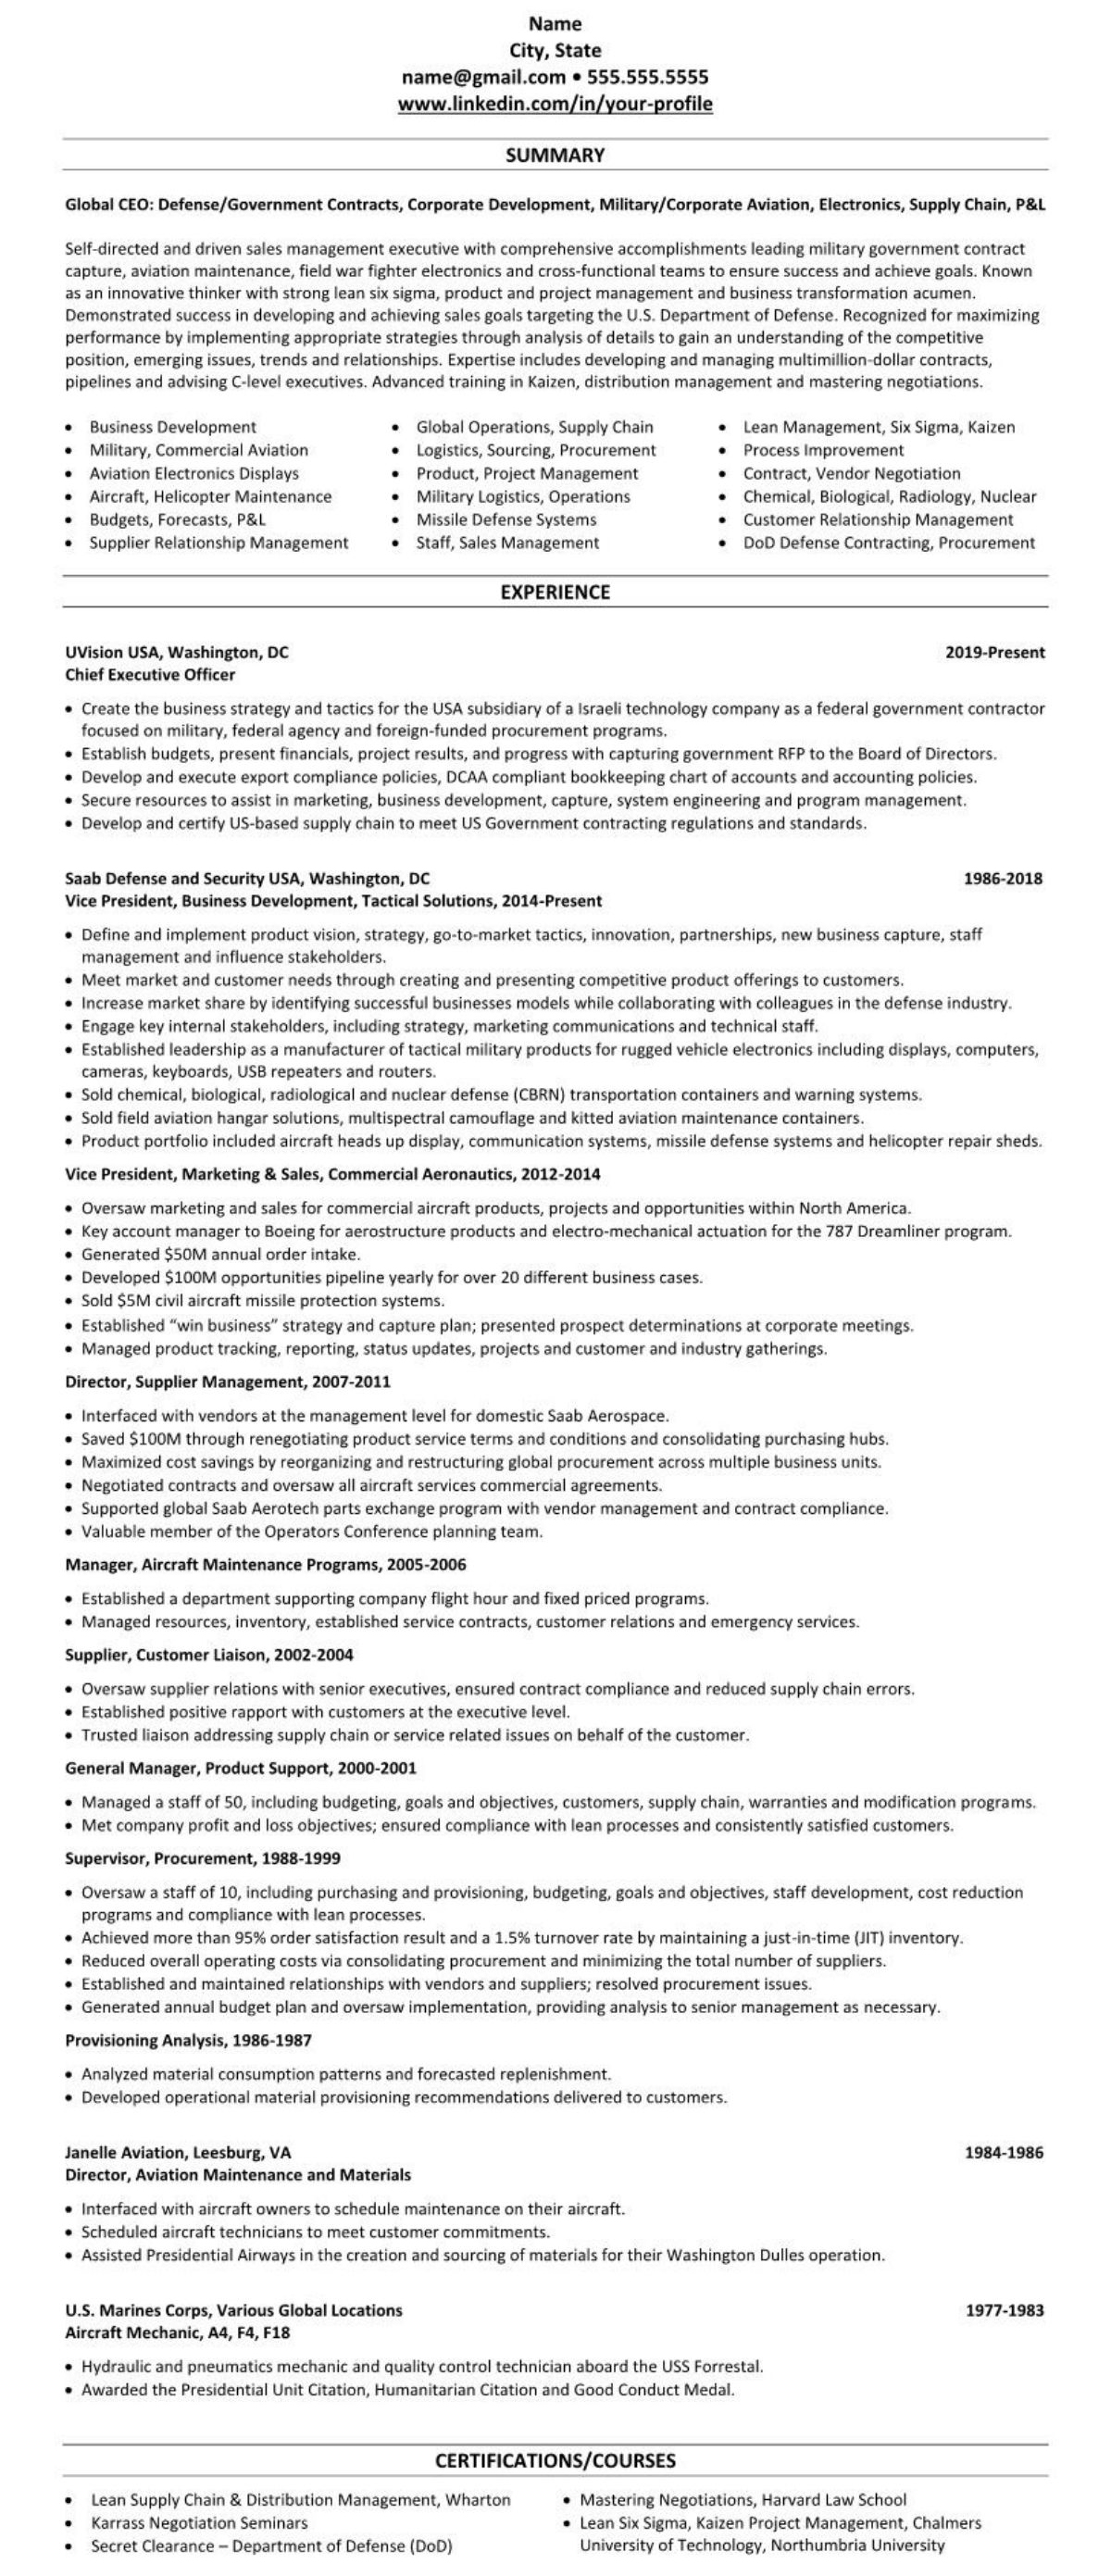 linkedin profile resume example  ceo  president  executive director